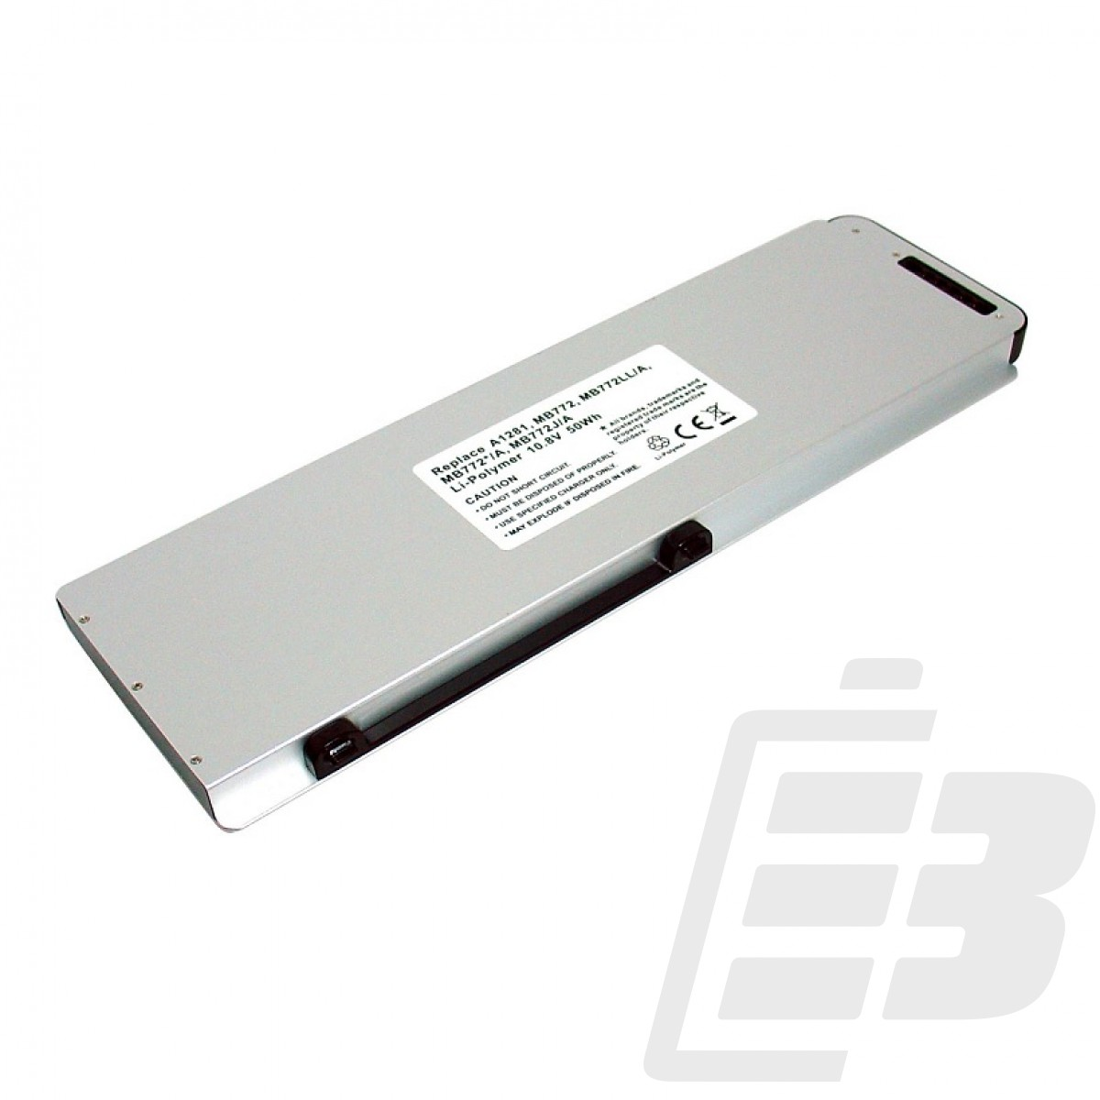 Laptop battery Apple MacBook Pro 15 Aluminum Unibody 2008_1